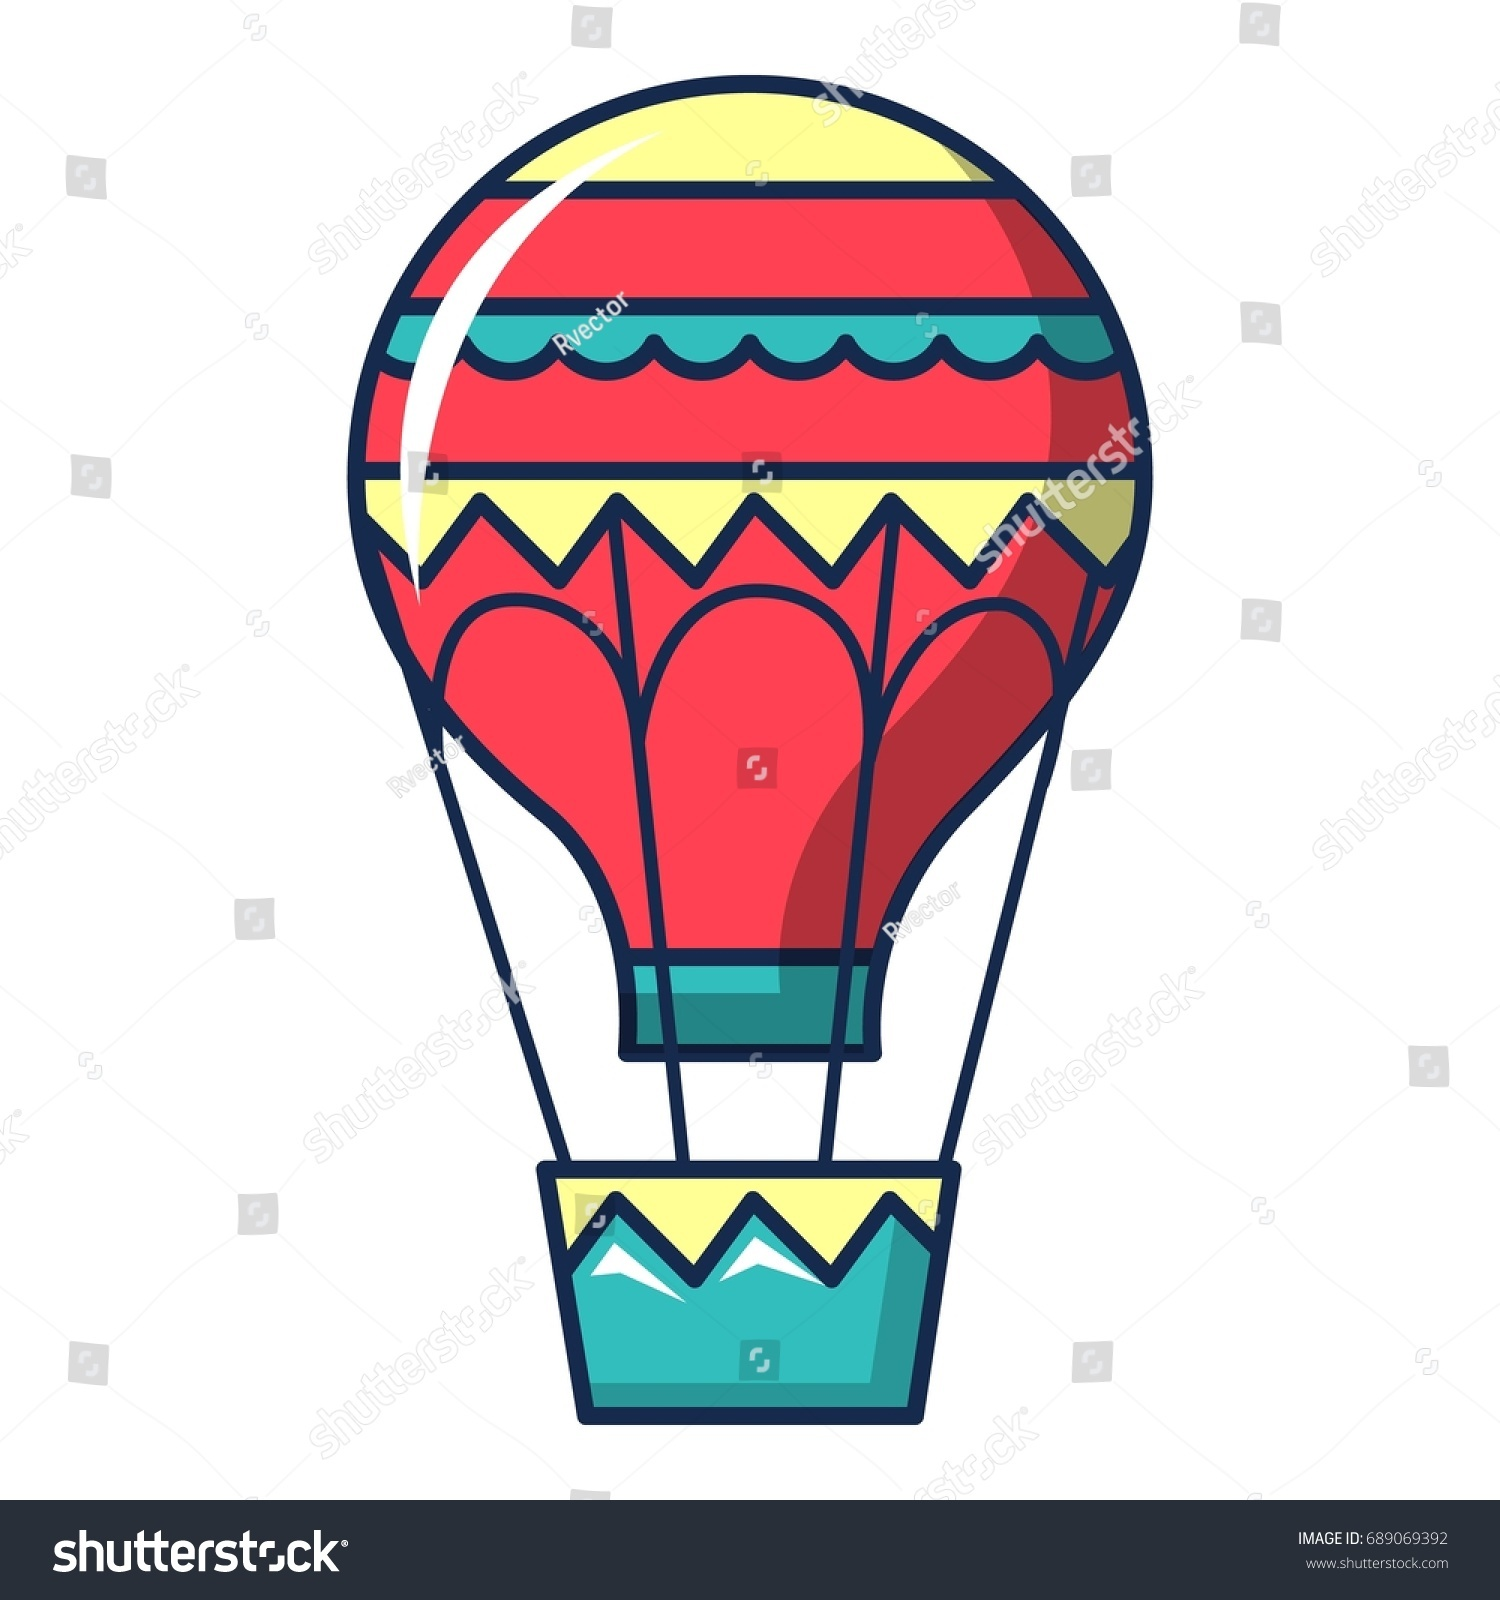 Hot Air Balloon Icon Cartoon Illustration Stock Vector Royalty Free 689069392